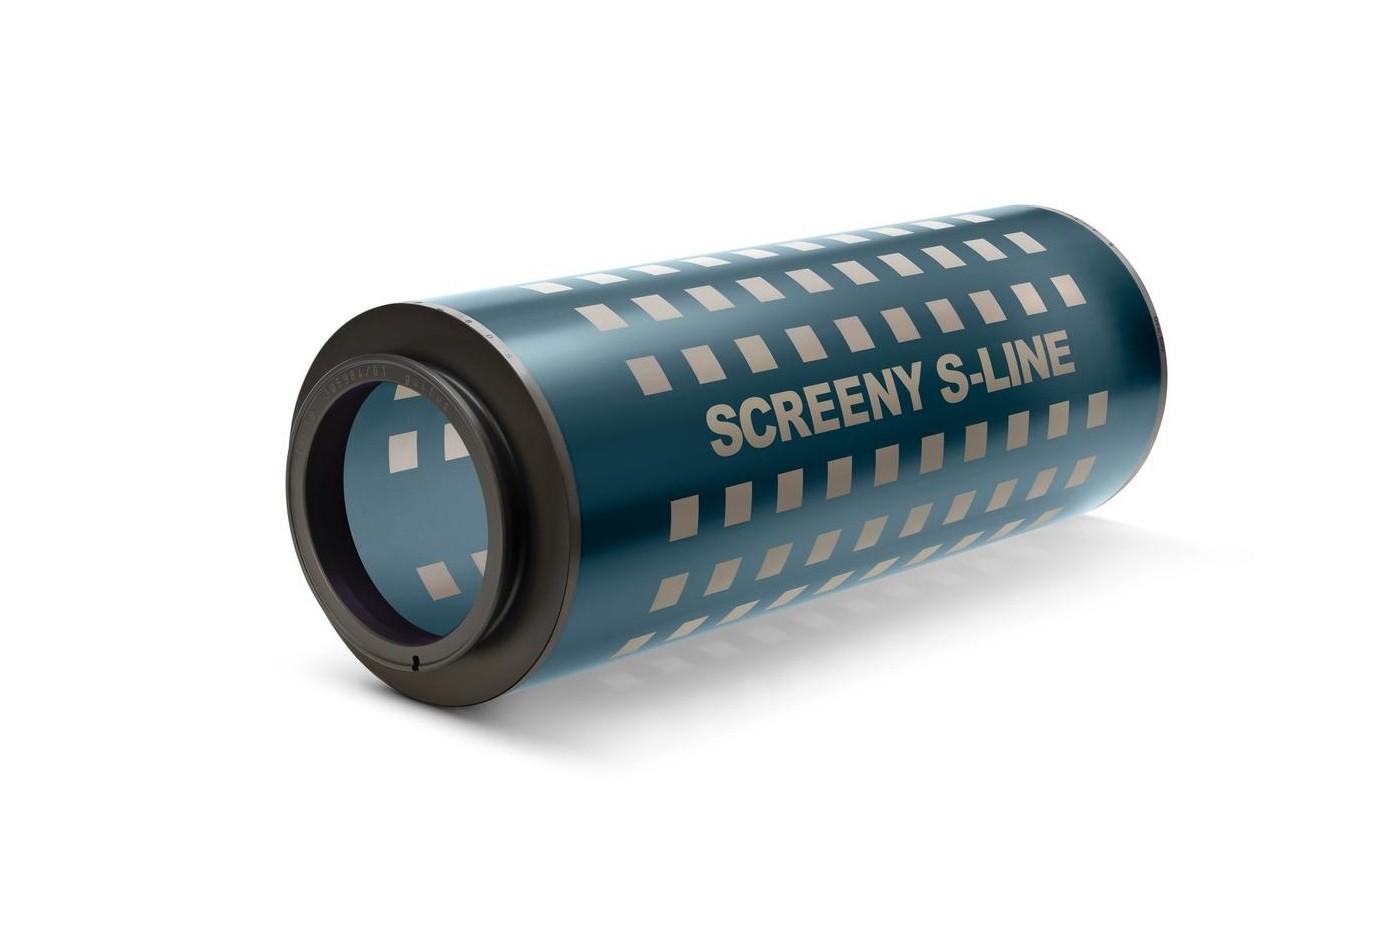 screeny_s-line_schatten-1200px